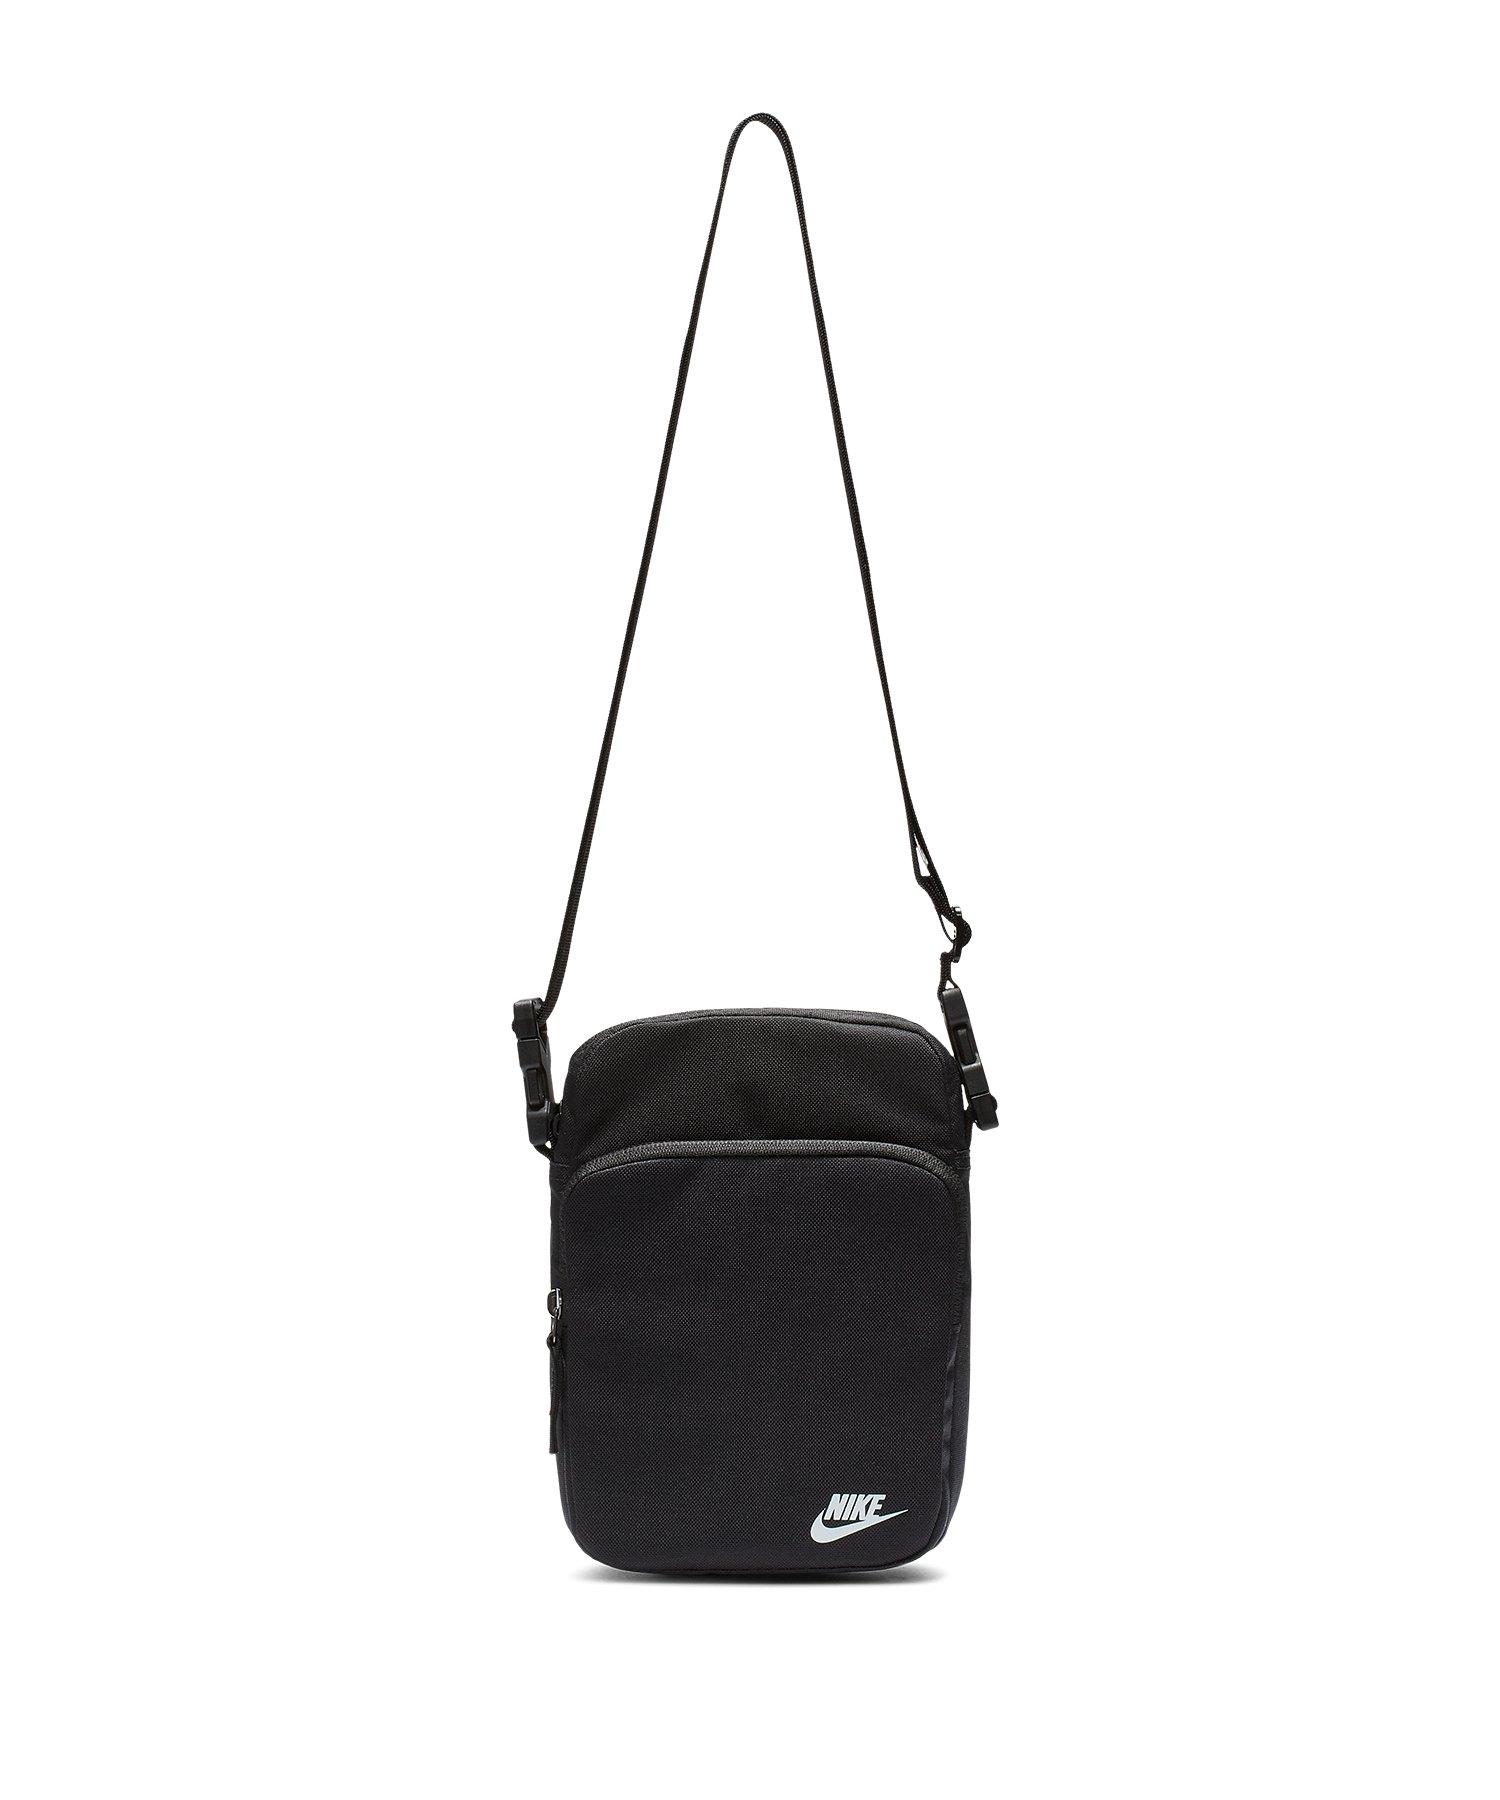 Nike Heritage Smit 2.0 Backpack Rucksack F010 - schwarz